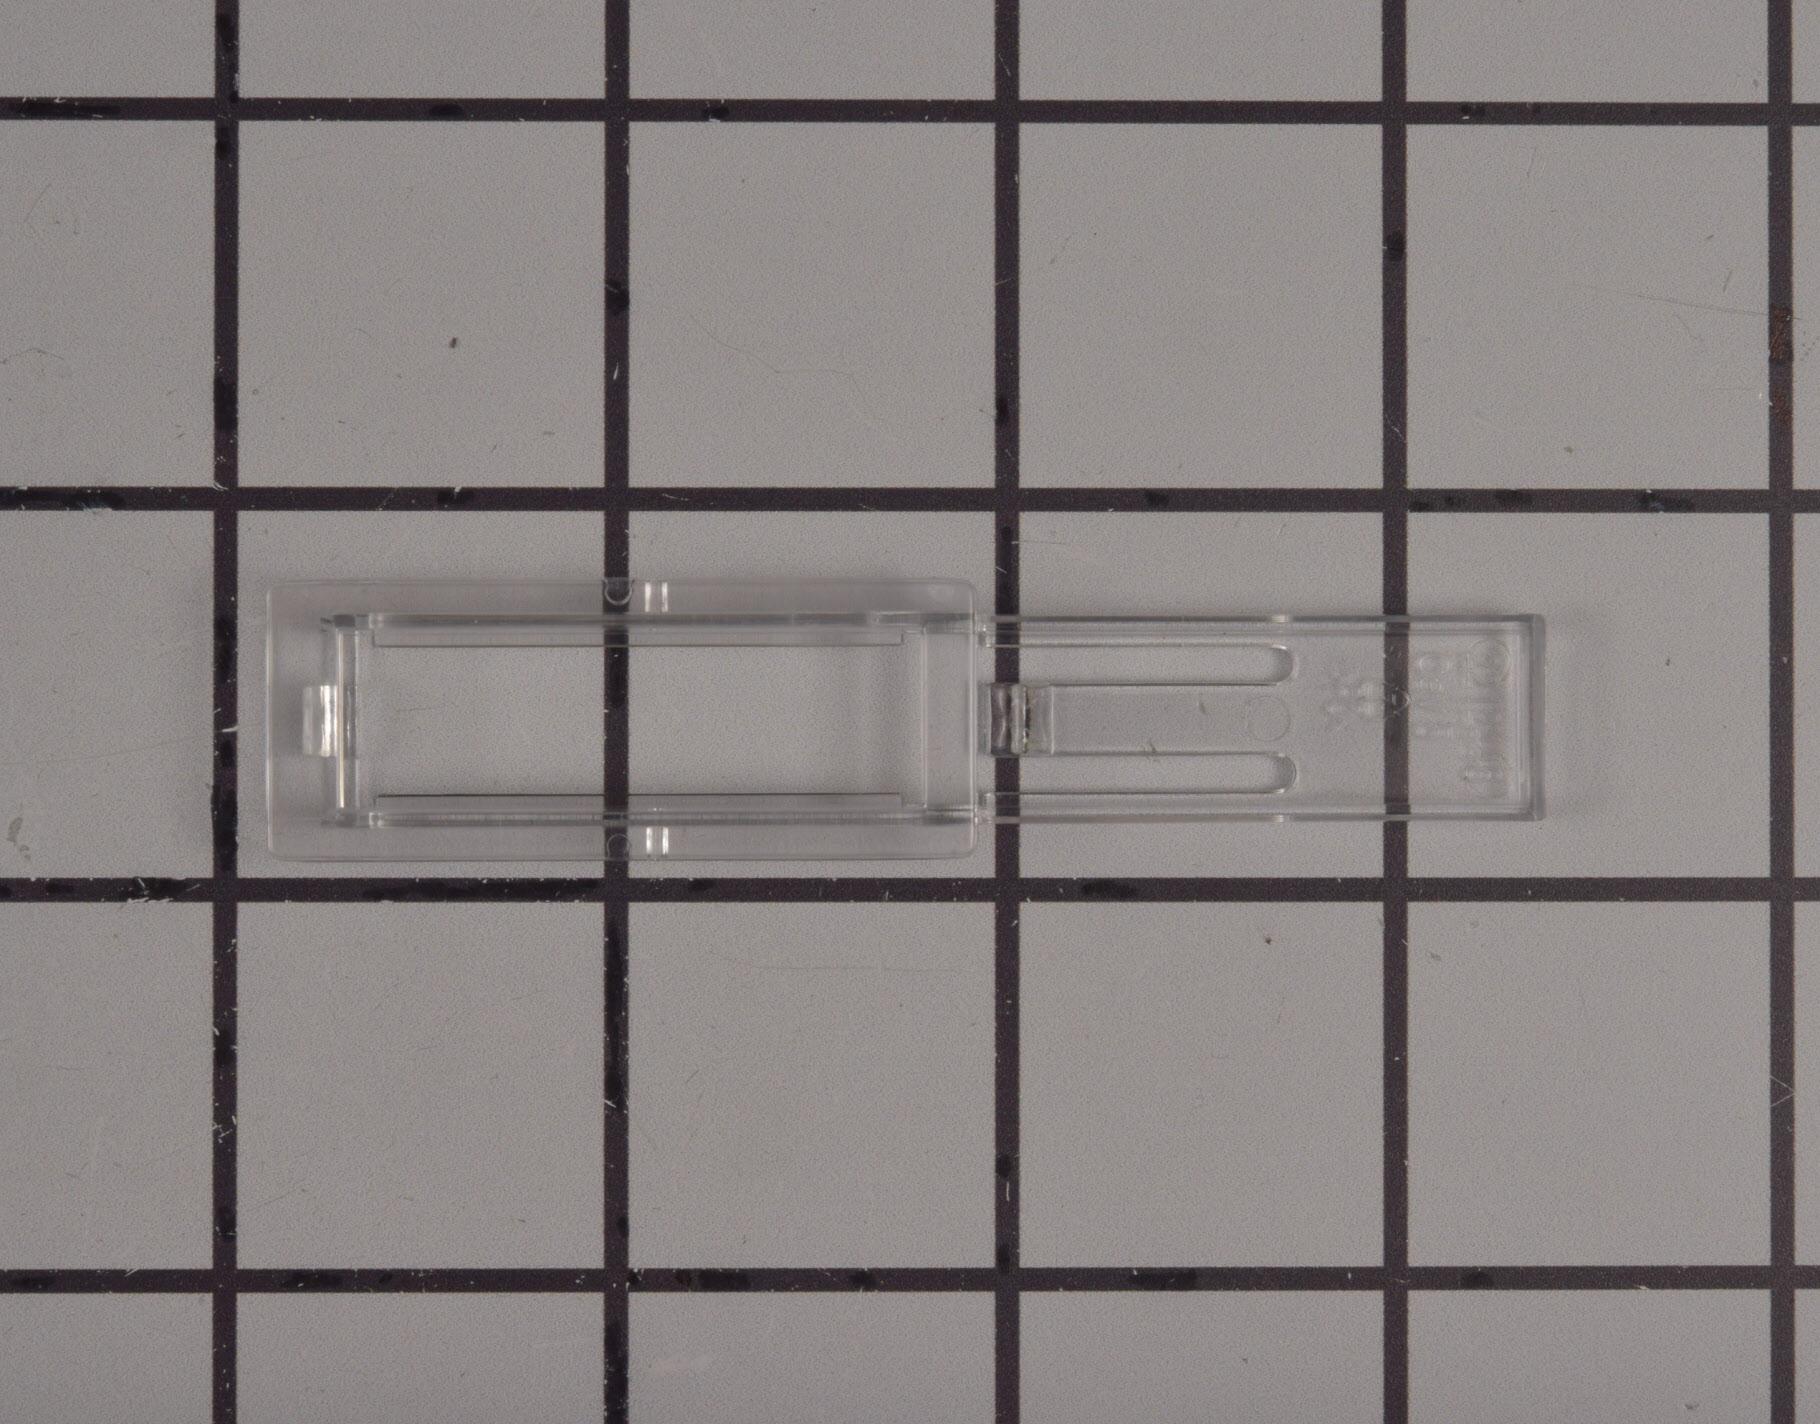 Whirlpool Refrigerator Part # WP2212446 - Humidity Control